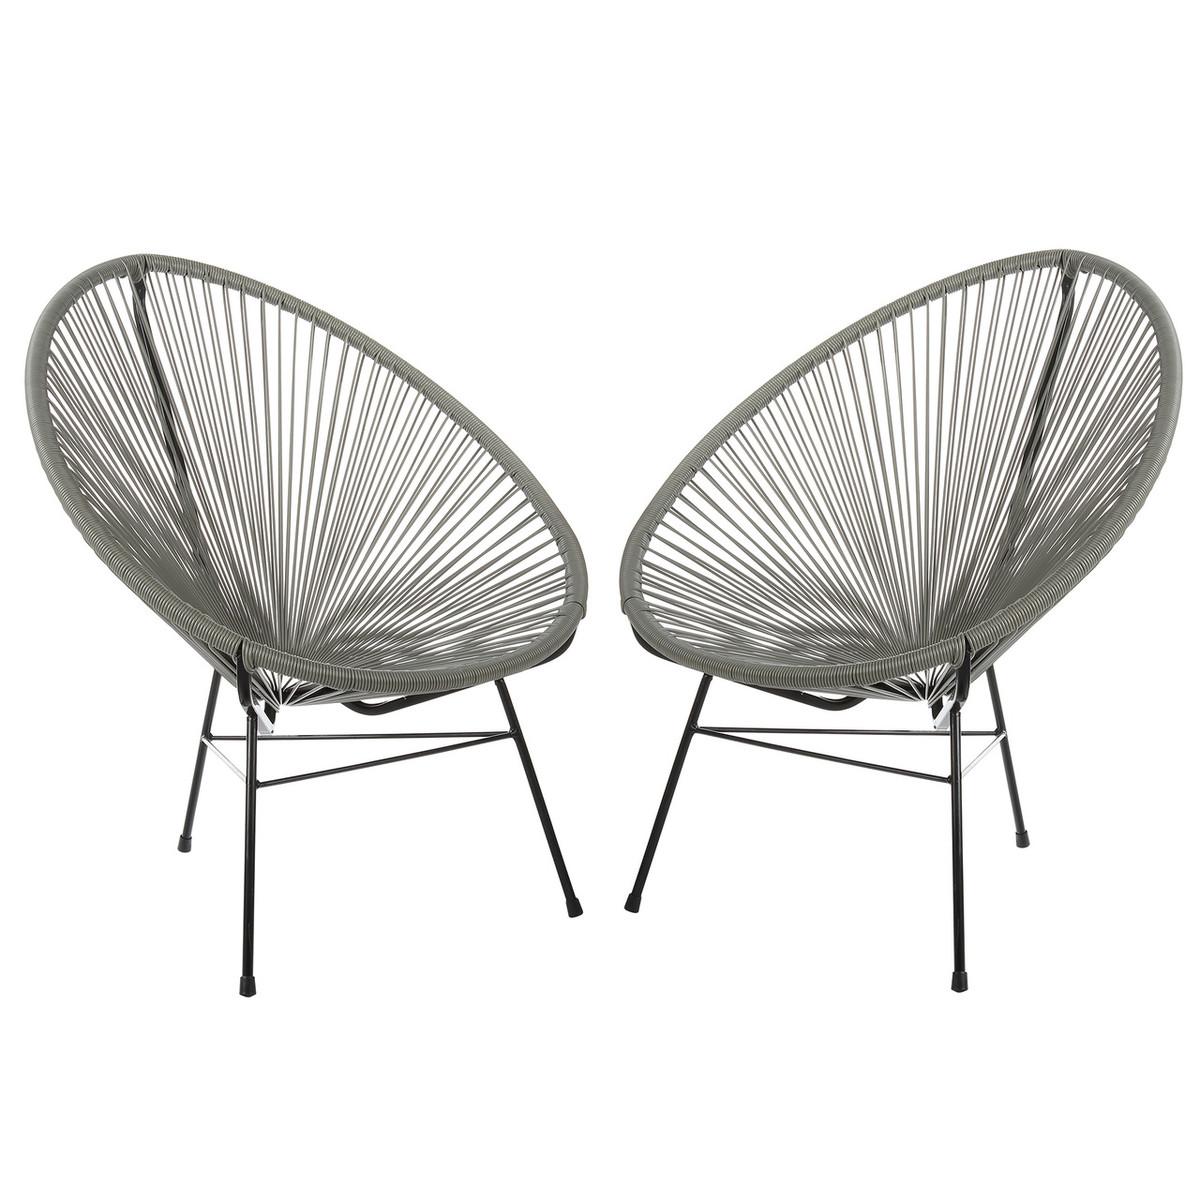 Genial Acapulco Lounge Chair   Grey, Set Of 2